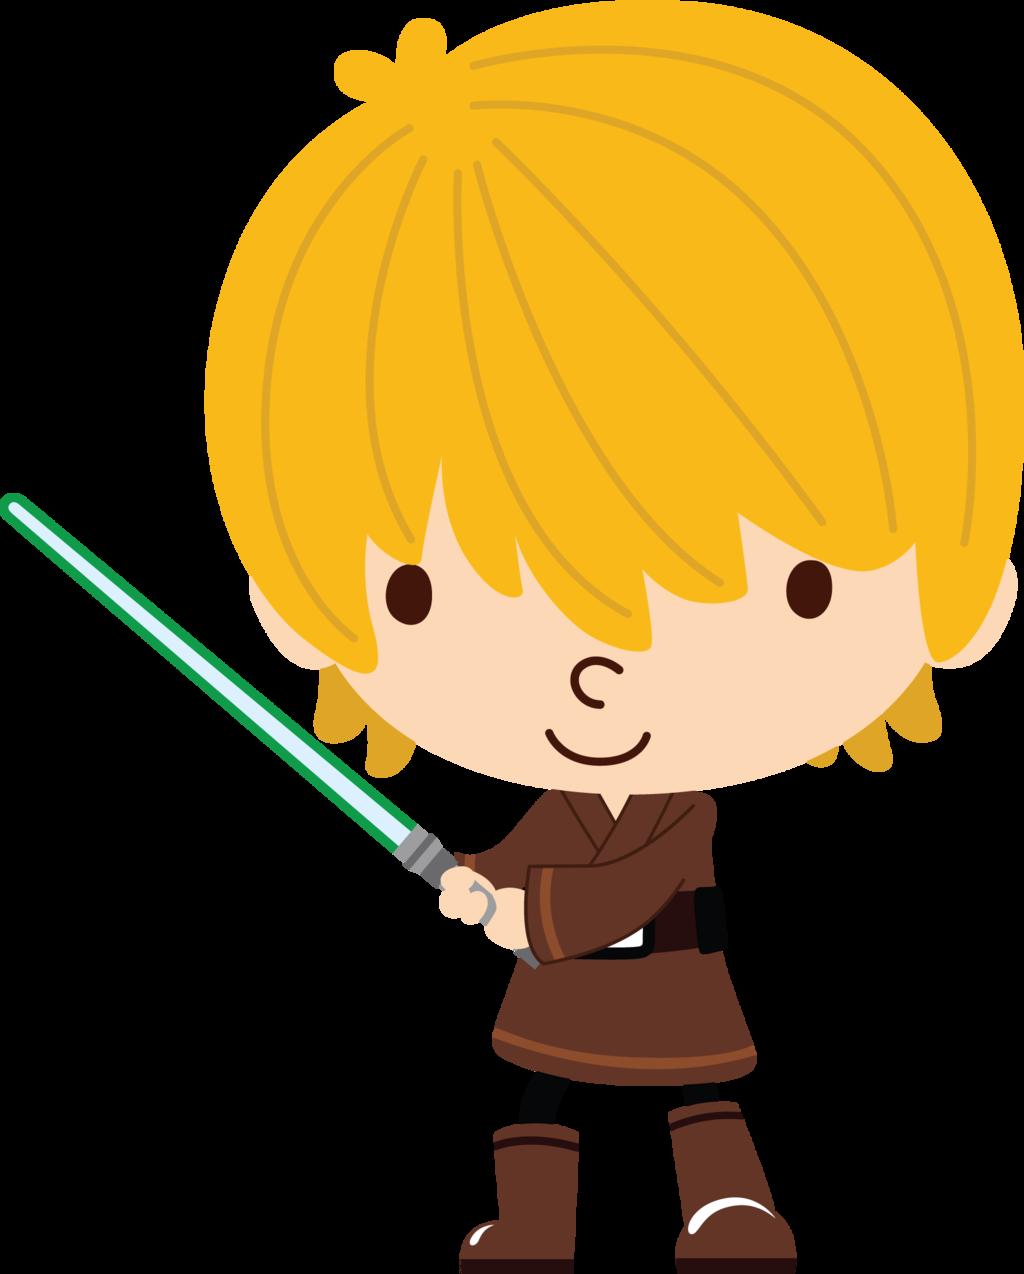 Luke Skywalker Star Wars Stickers Star Wars Theme Star Wars Theme Party